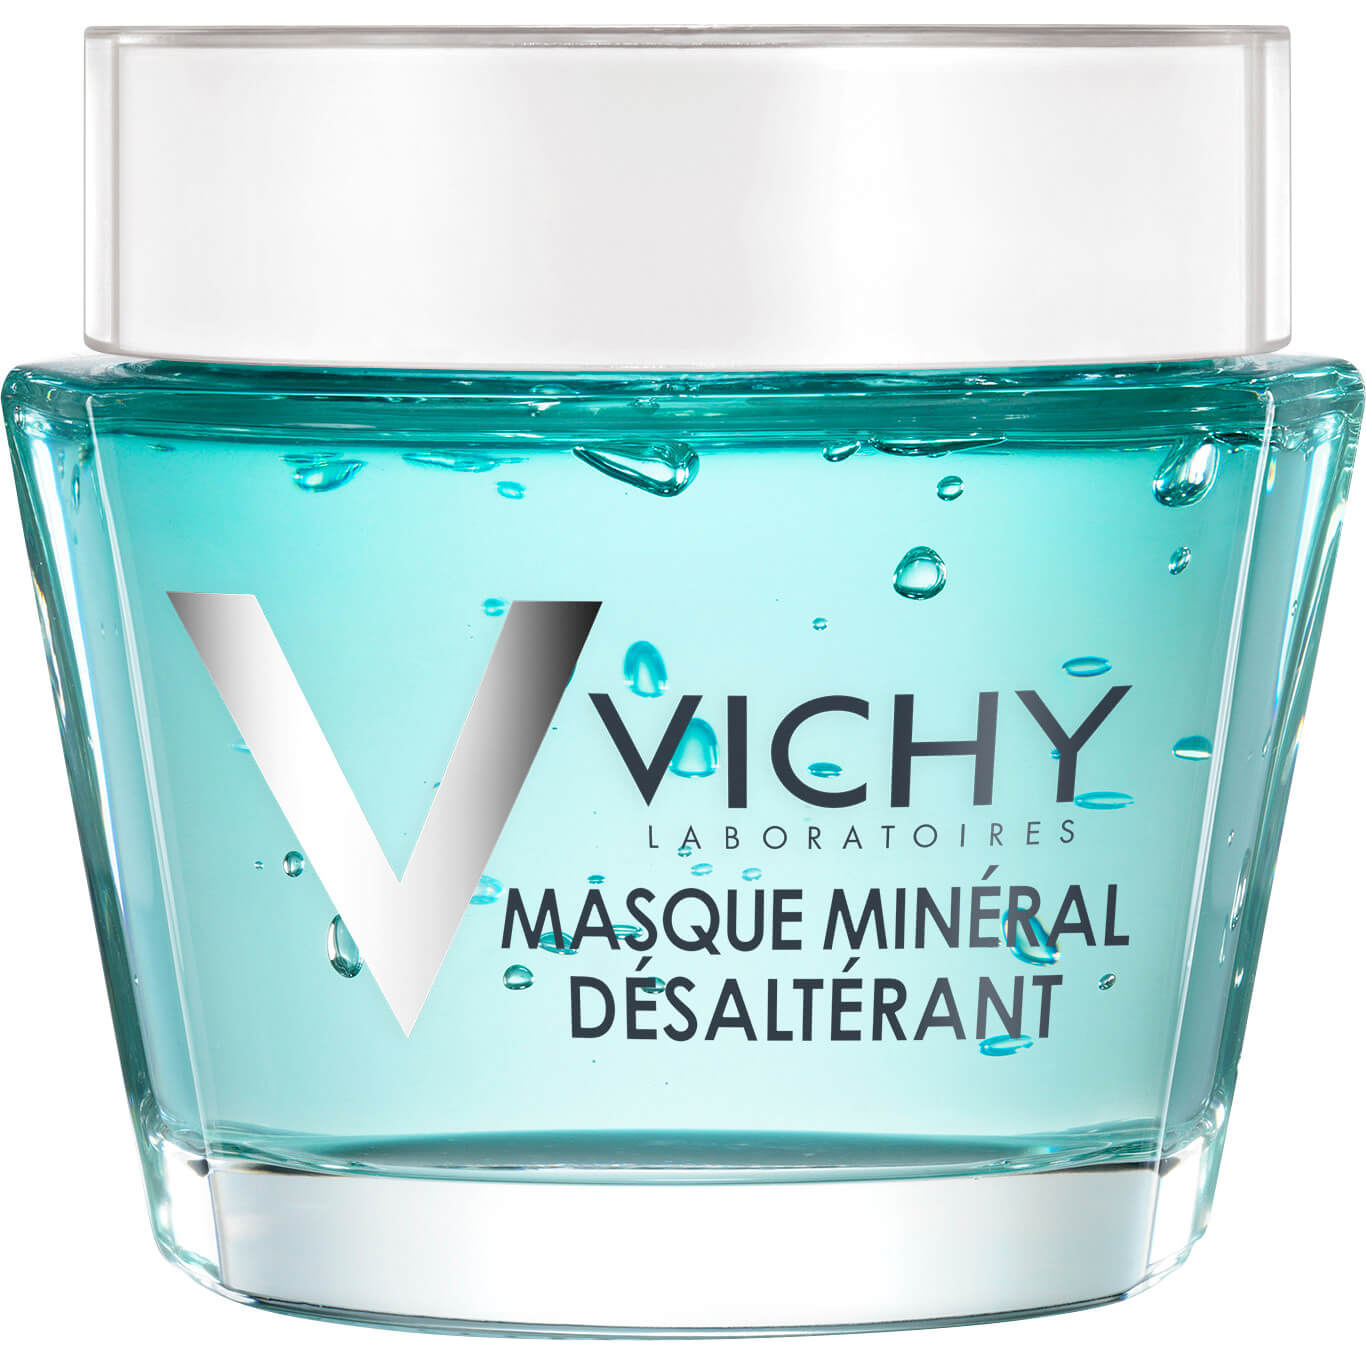 Vichy Masque Mineral Desalterant Μάσκα Ενυδάτωσης & Καταπράϋνσης για Ευαίσθητες Επιδερμίδες 75ml